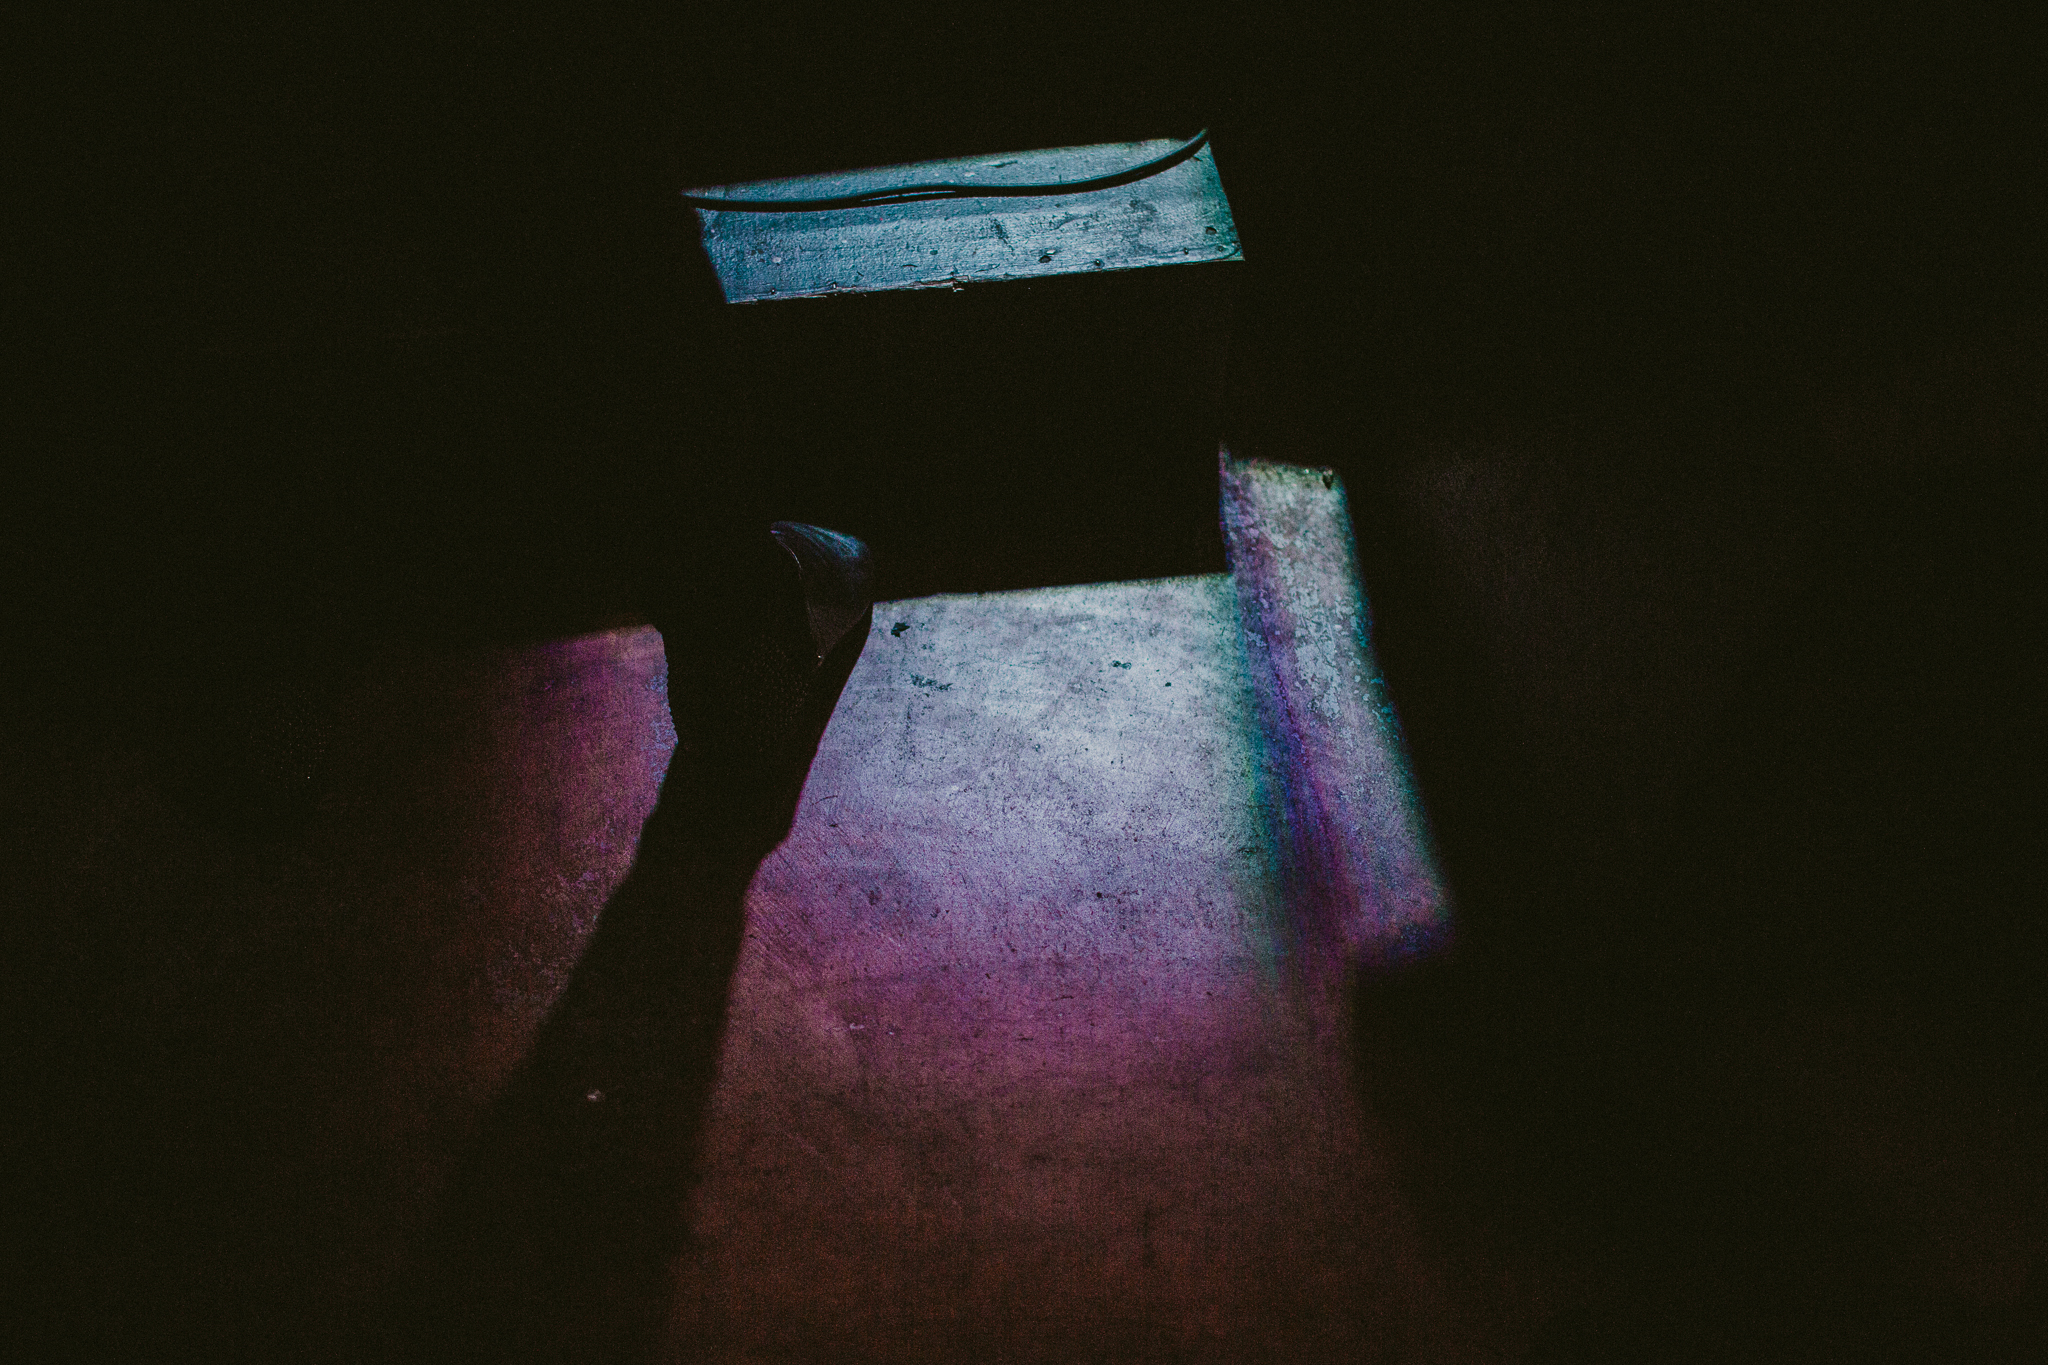 untitled shoot-4419.jpg